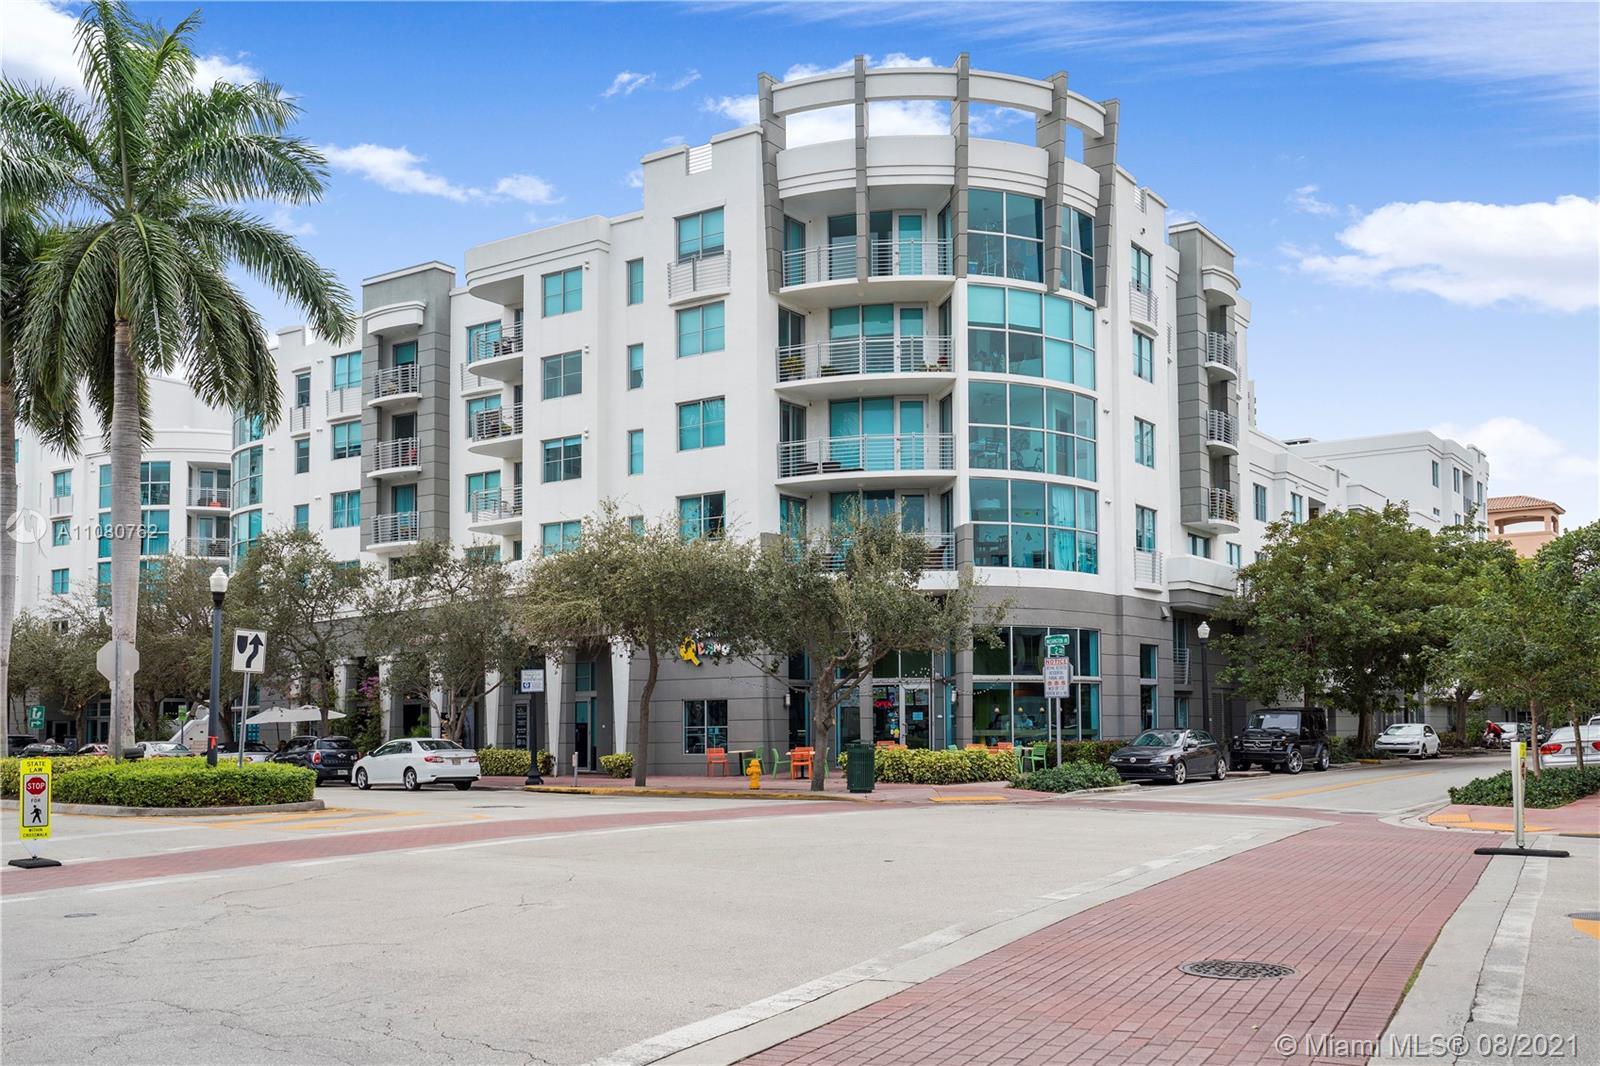 Cosmopolitan #2516 - 110 Washington Ave #2516, Miami Beach, FL 33139